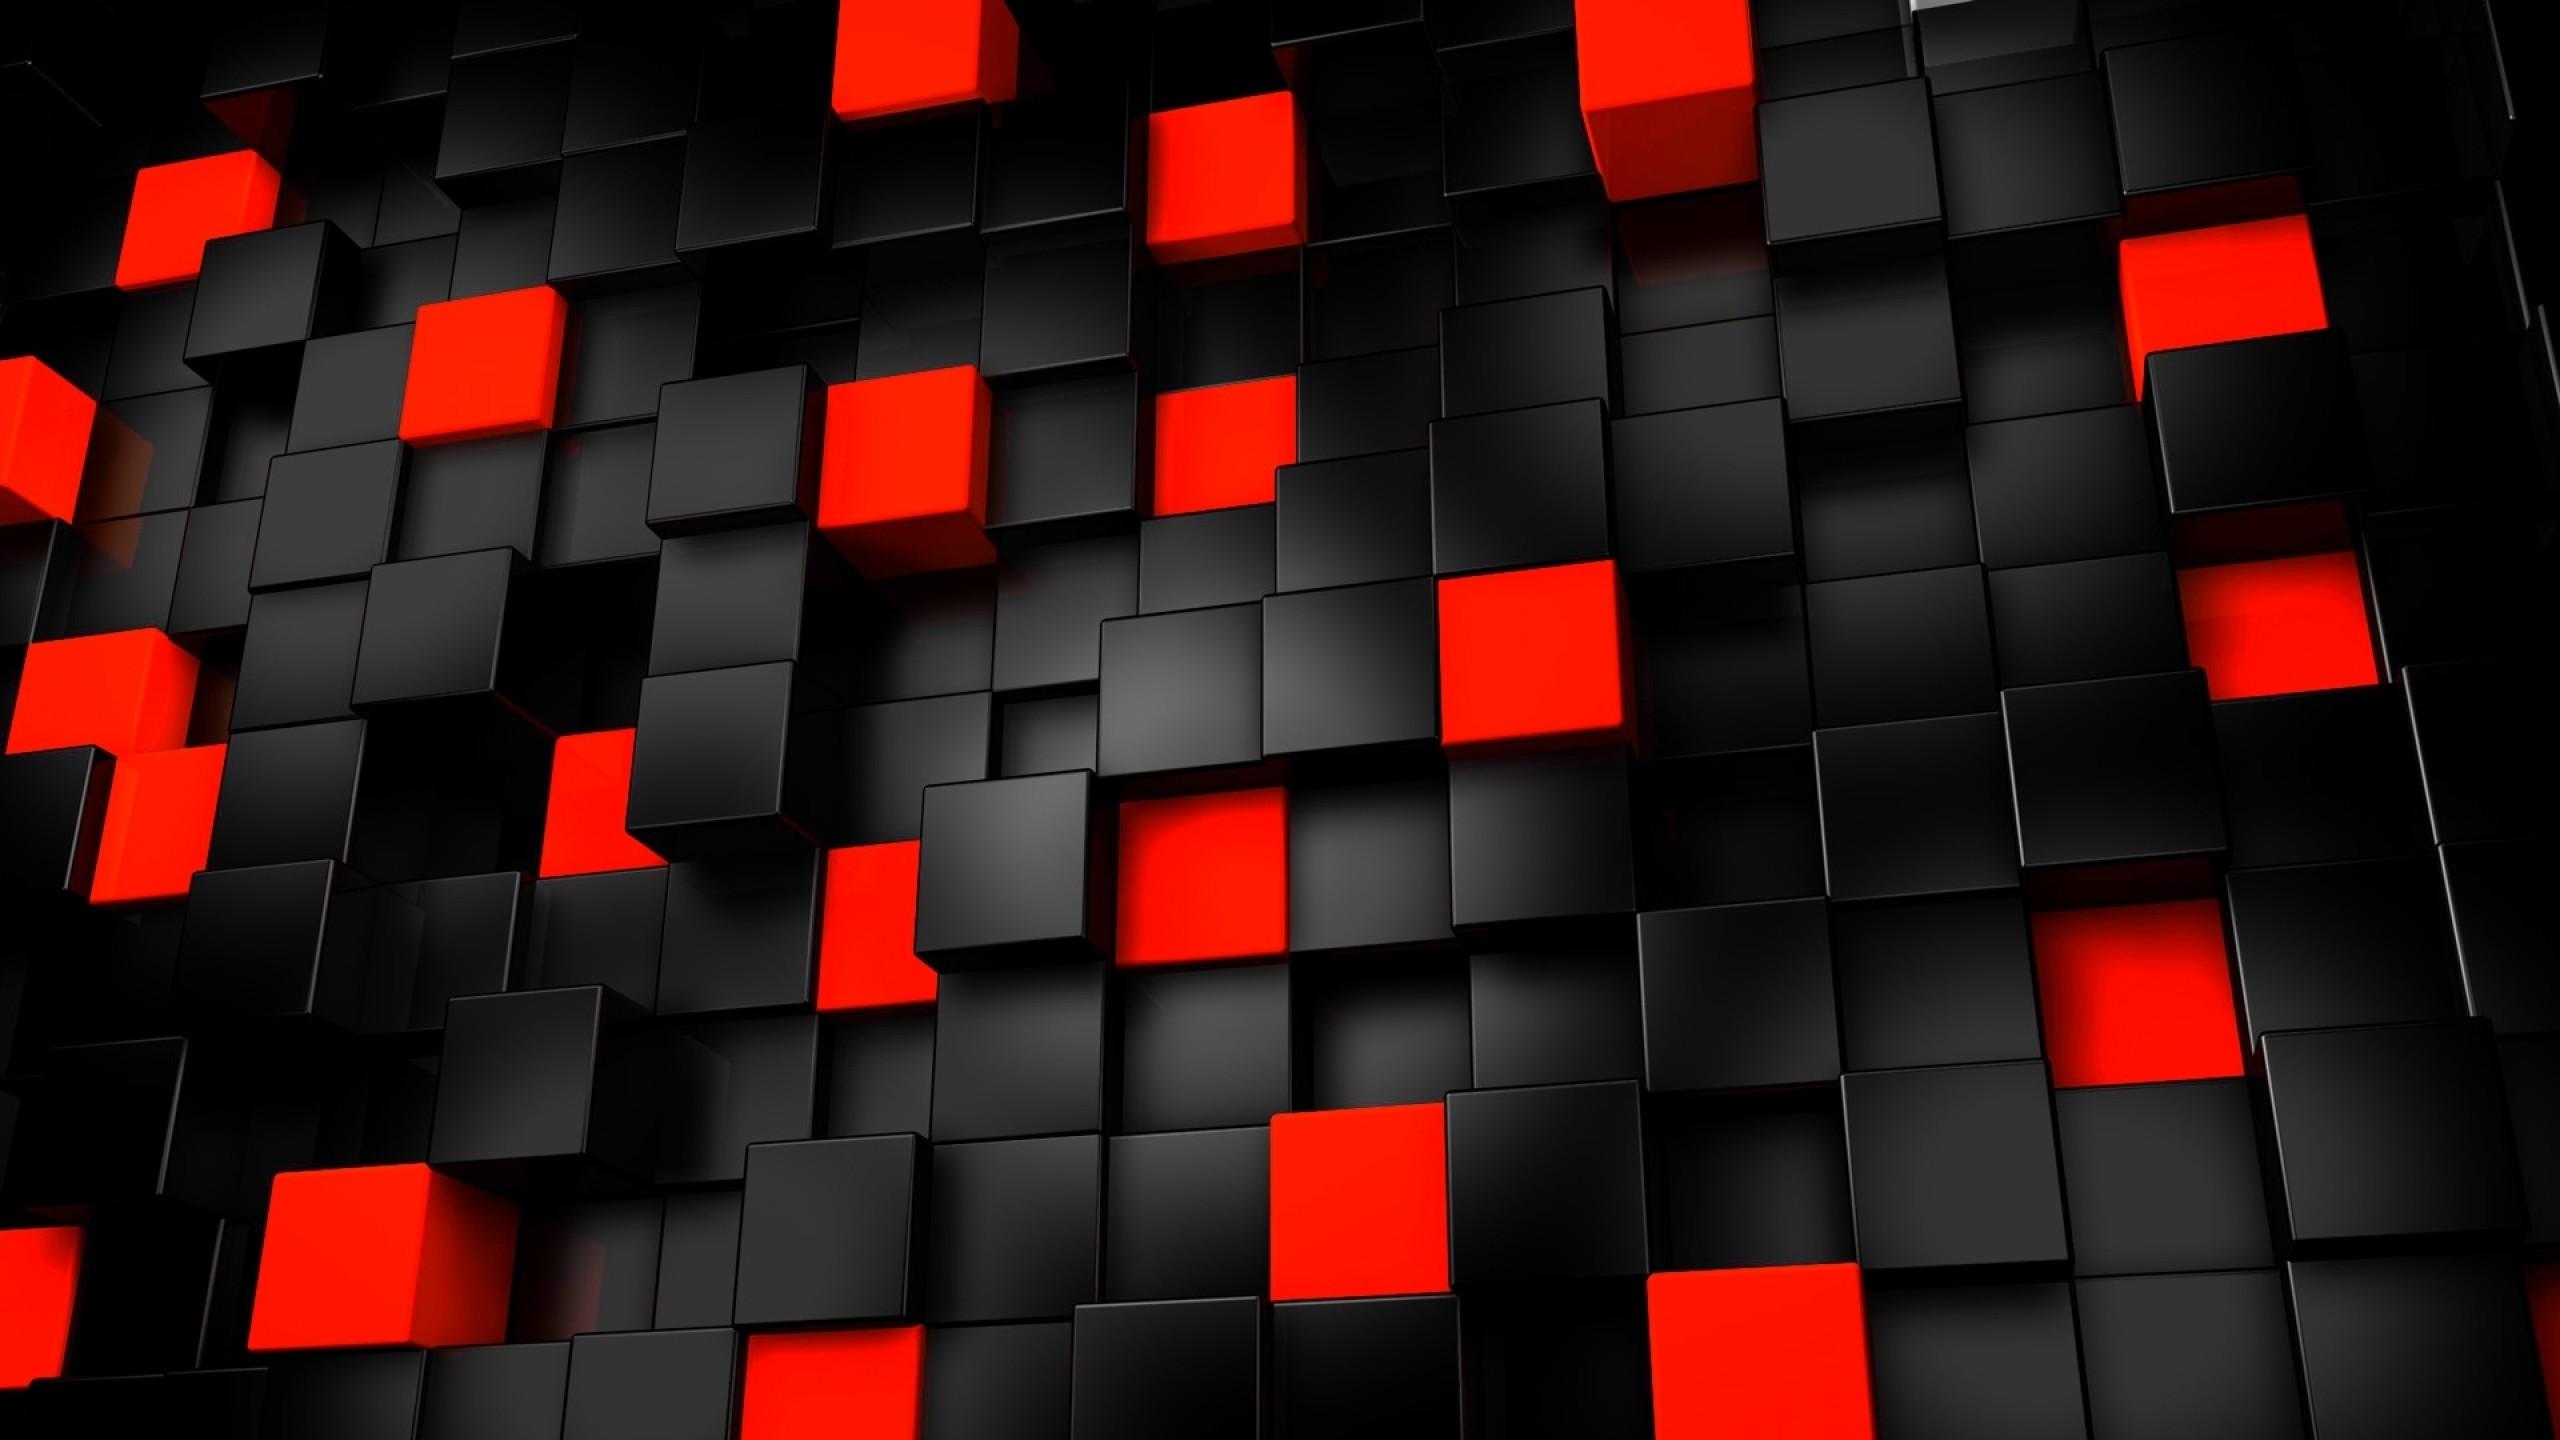 Res: 2560x1440, 3D, Cubes, Black, Red